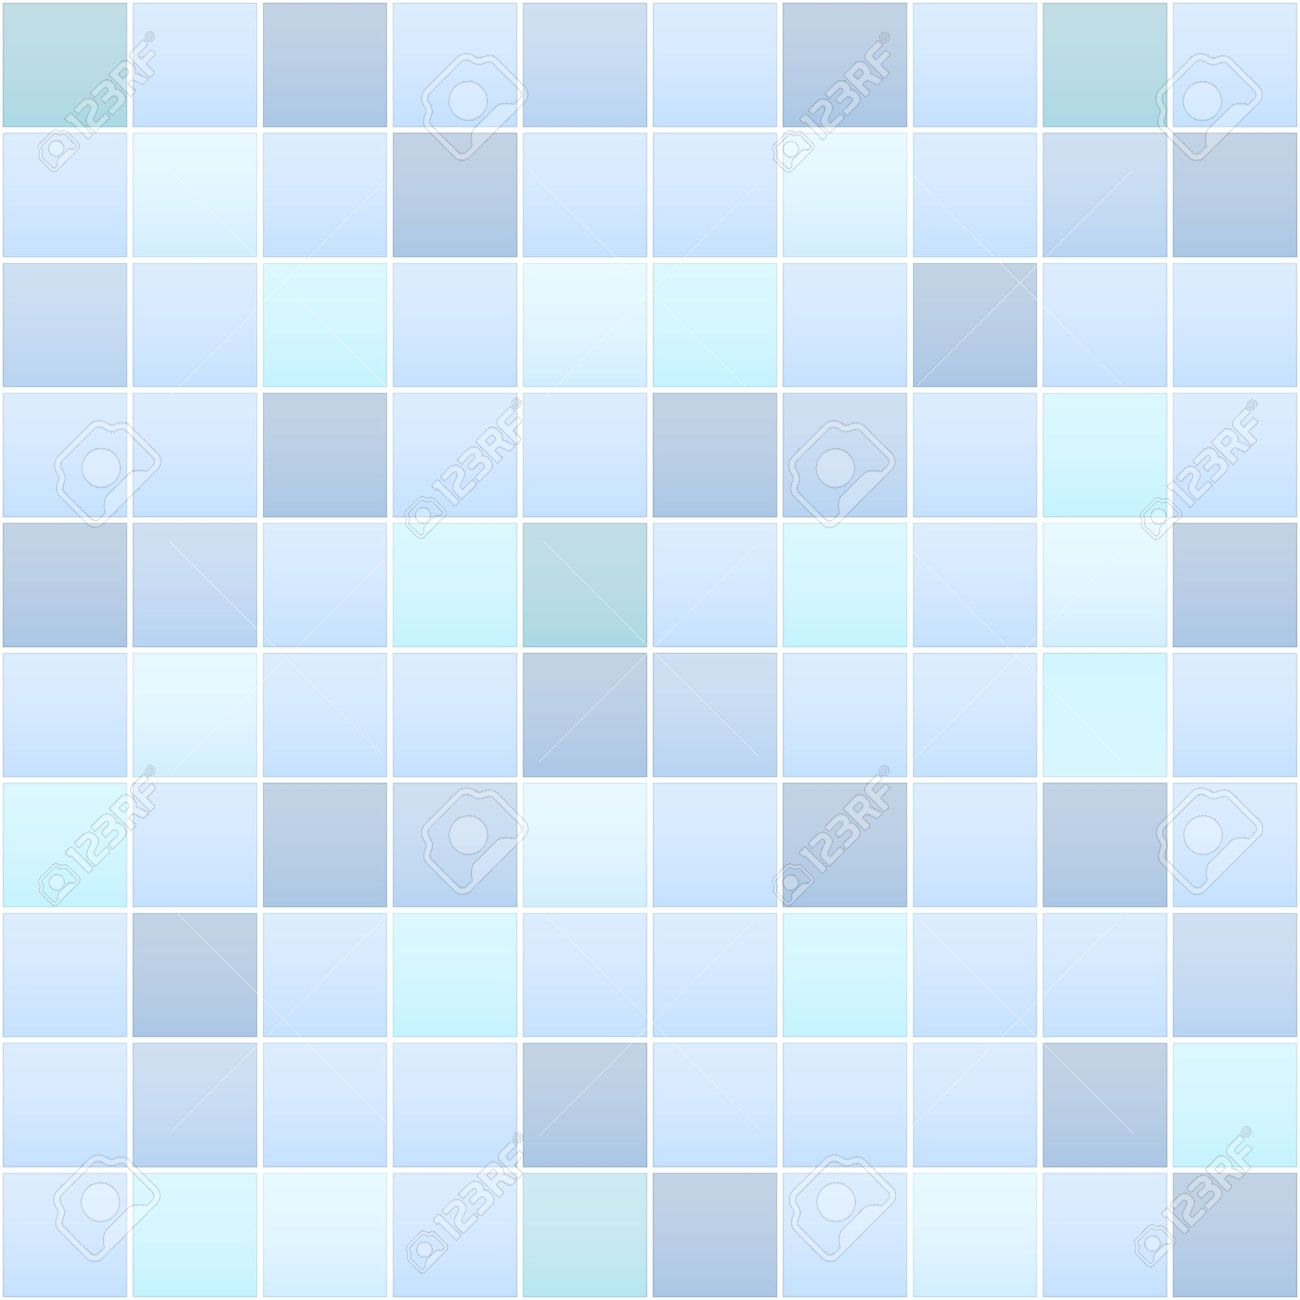 Detailed Illustration Of A Bathroom Tile Pattern Stock Vector   17754520